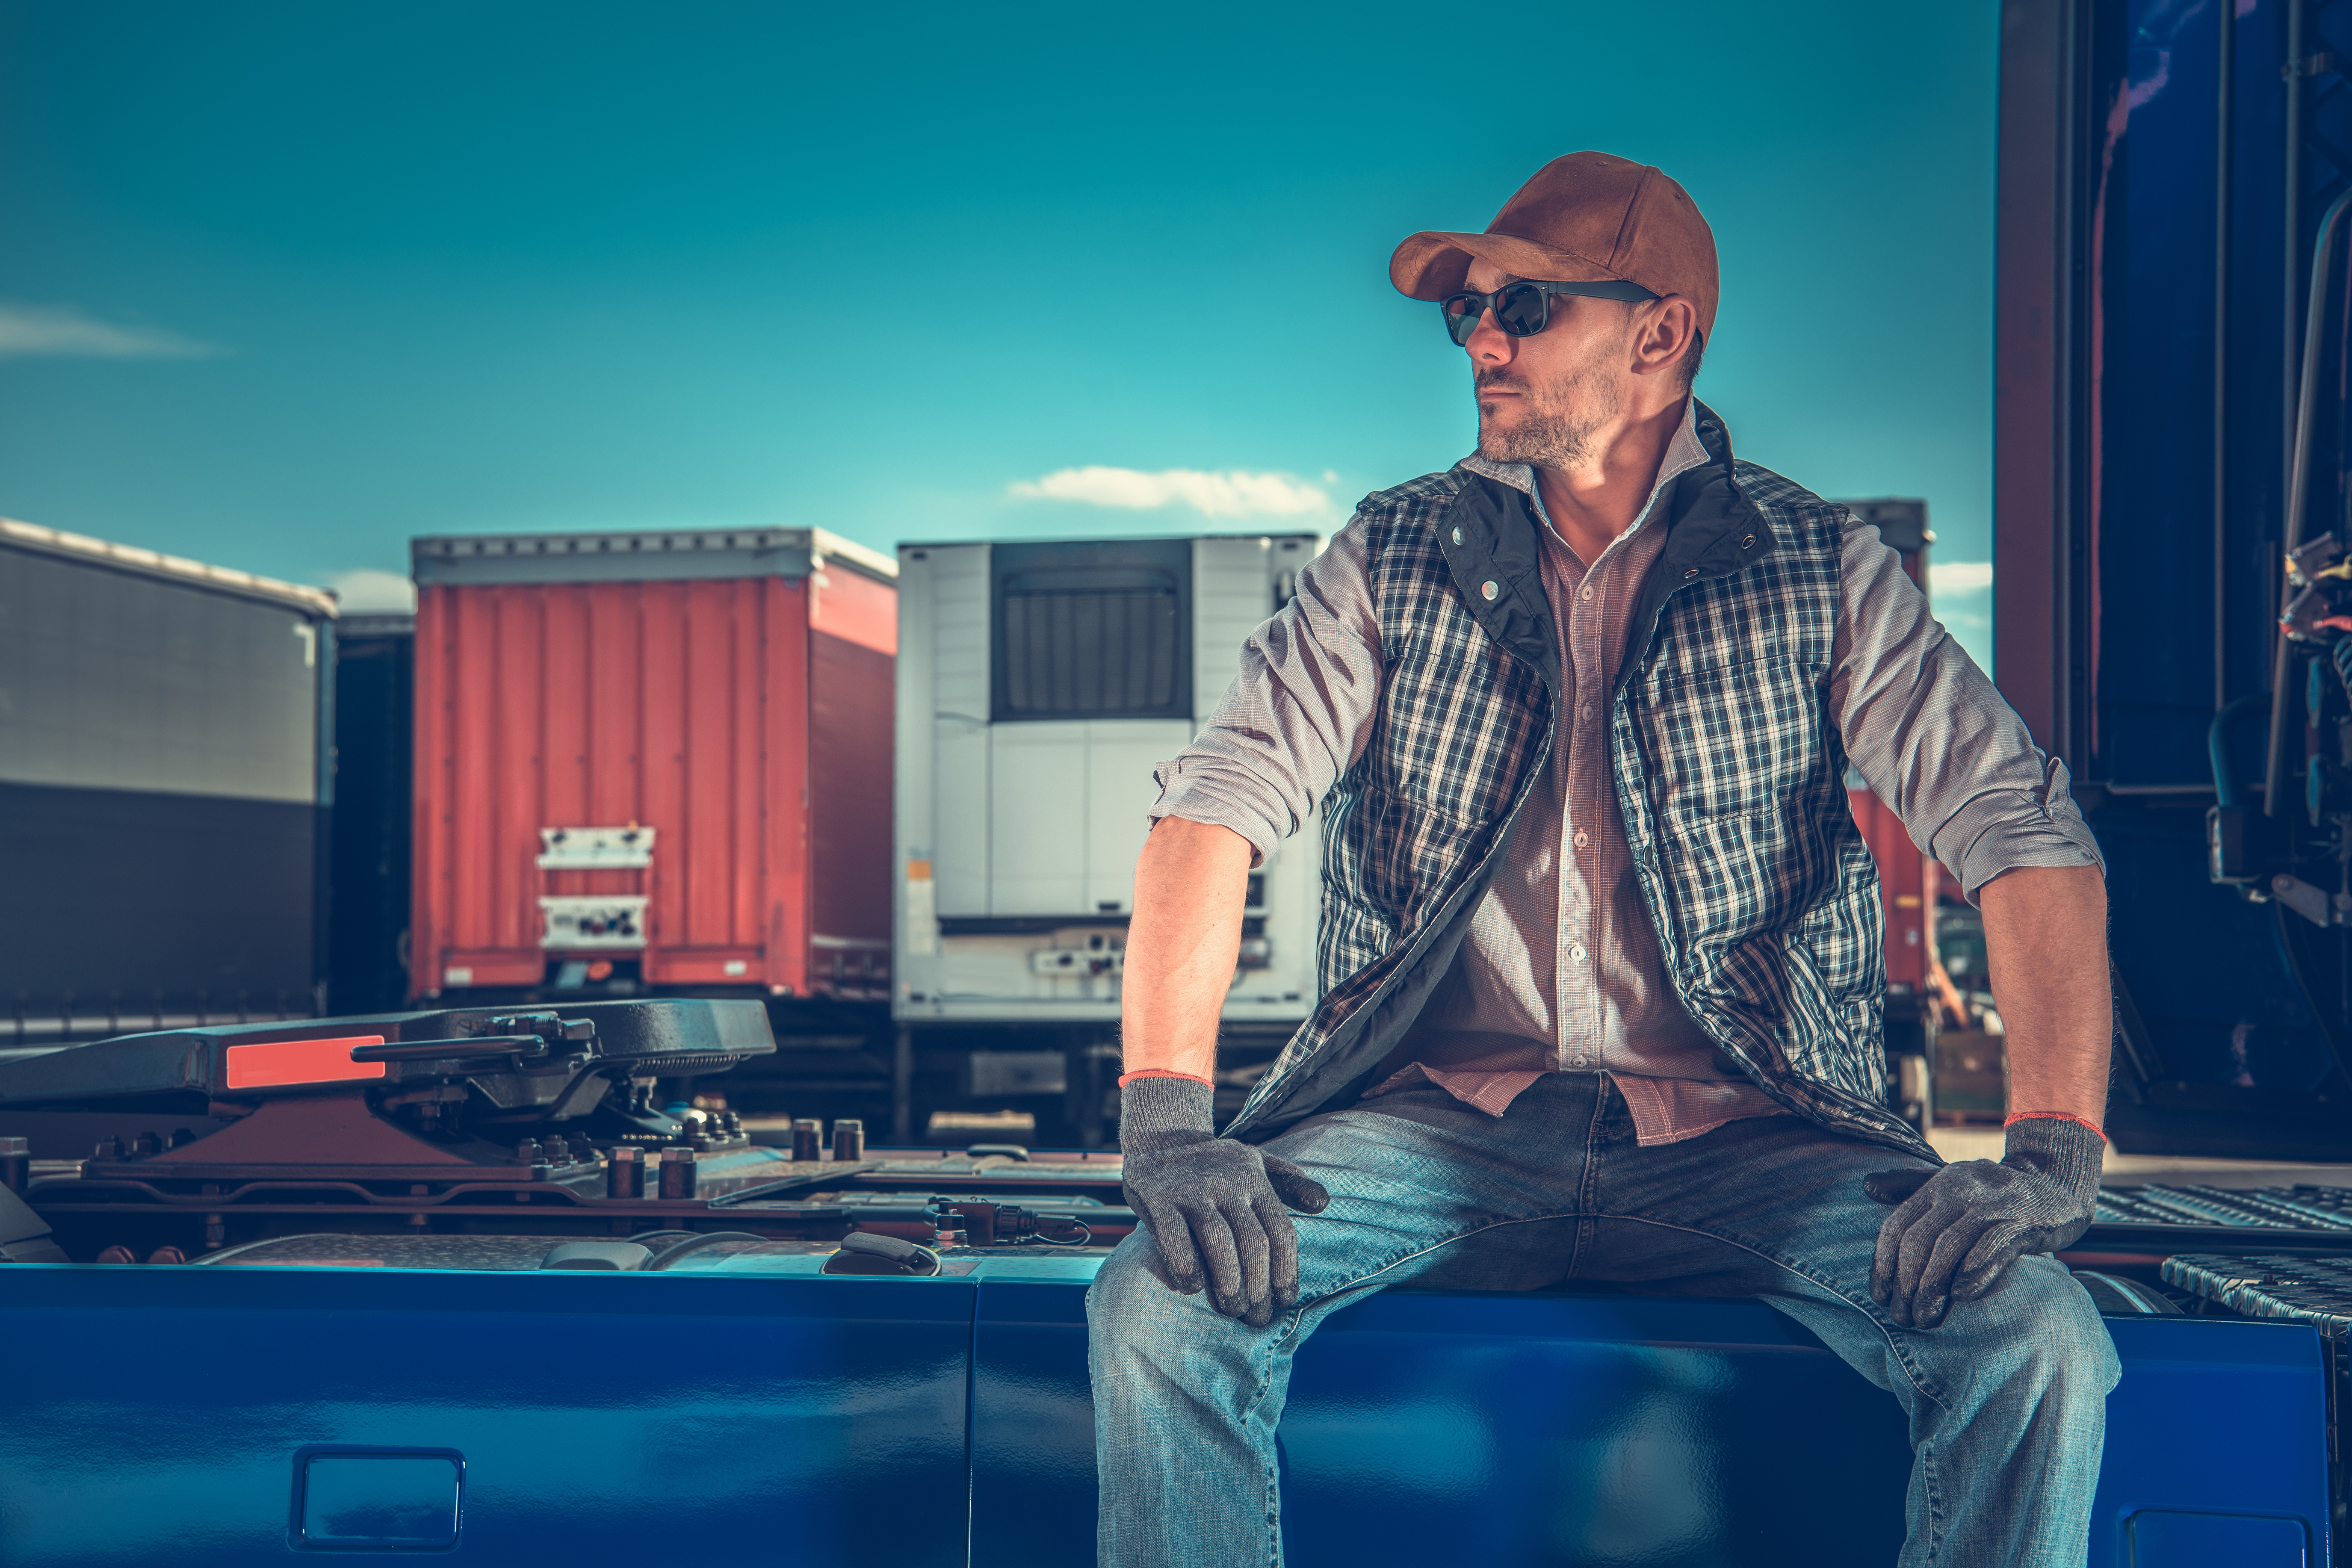 Trucker waiting for loads